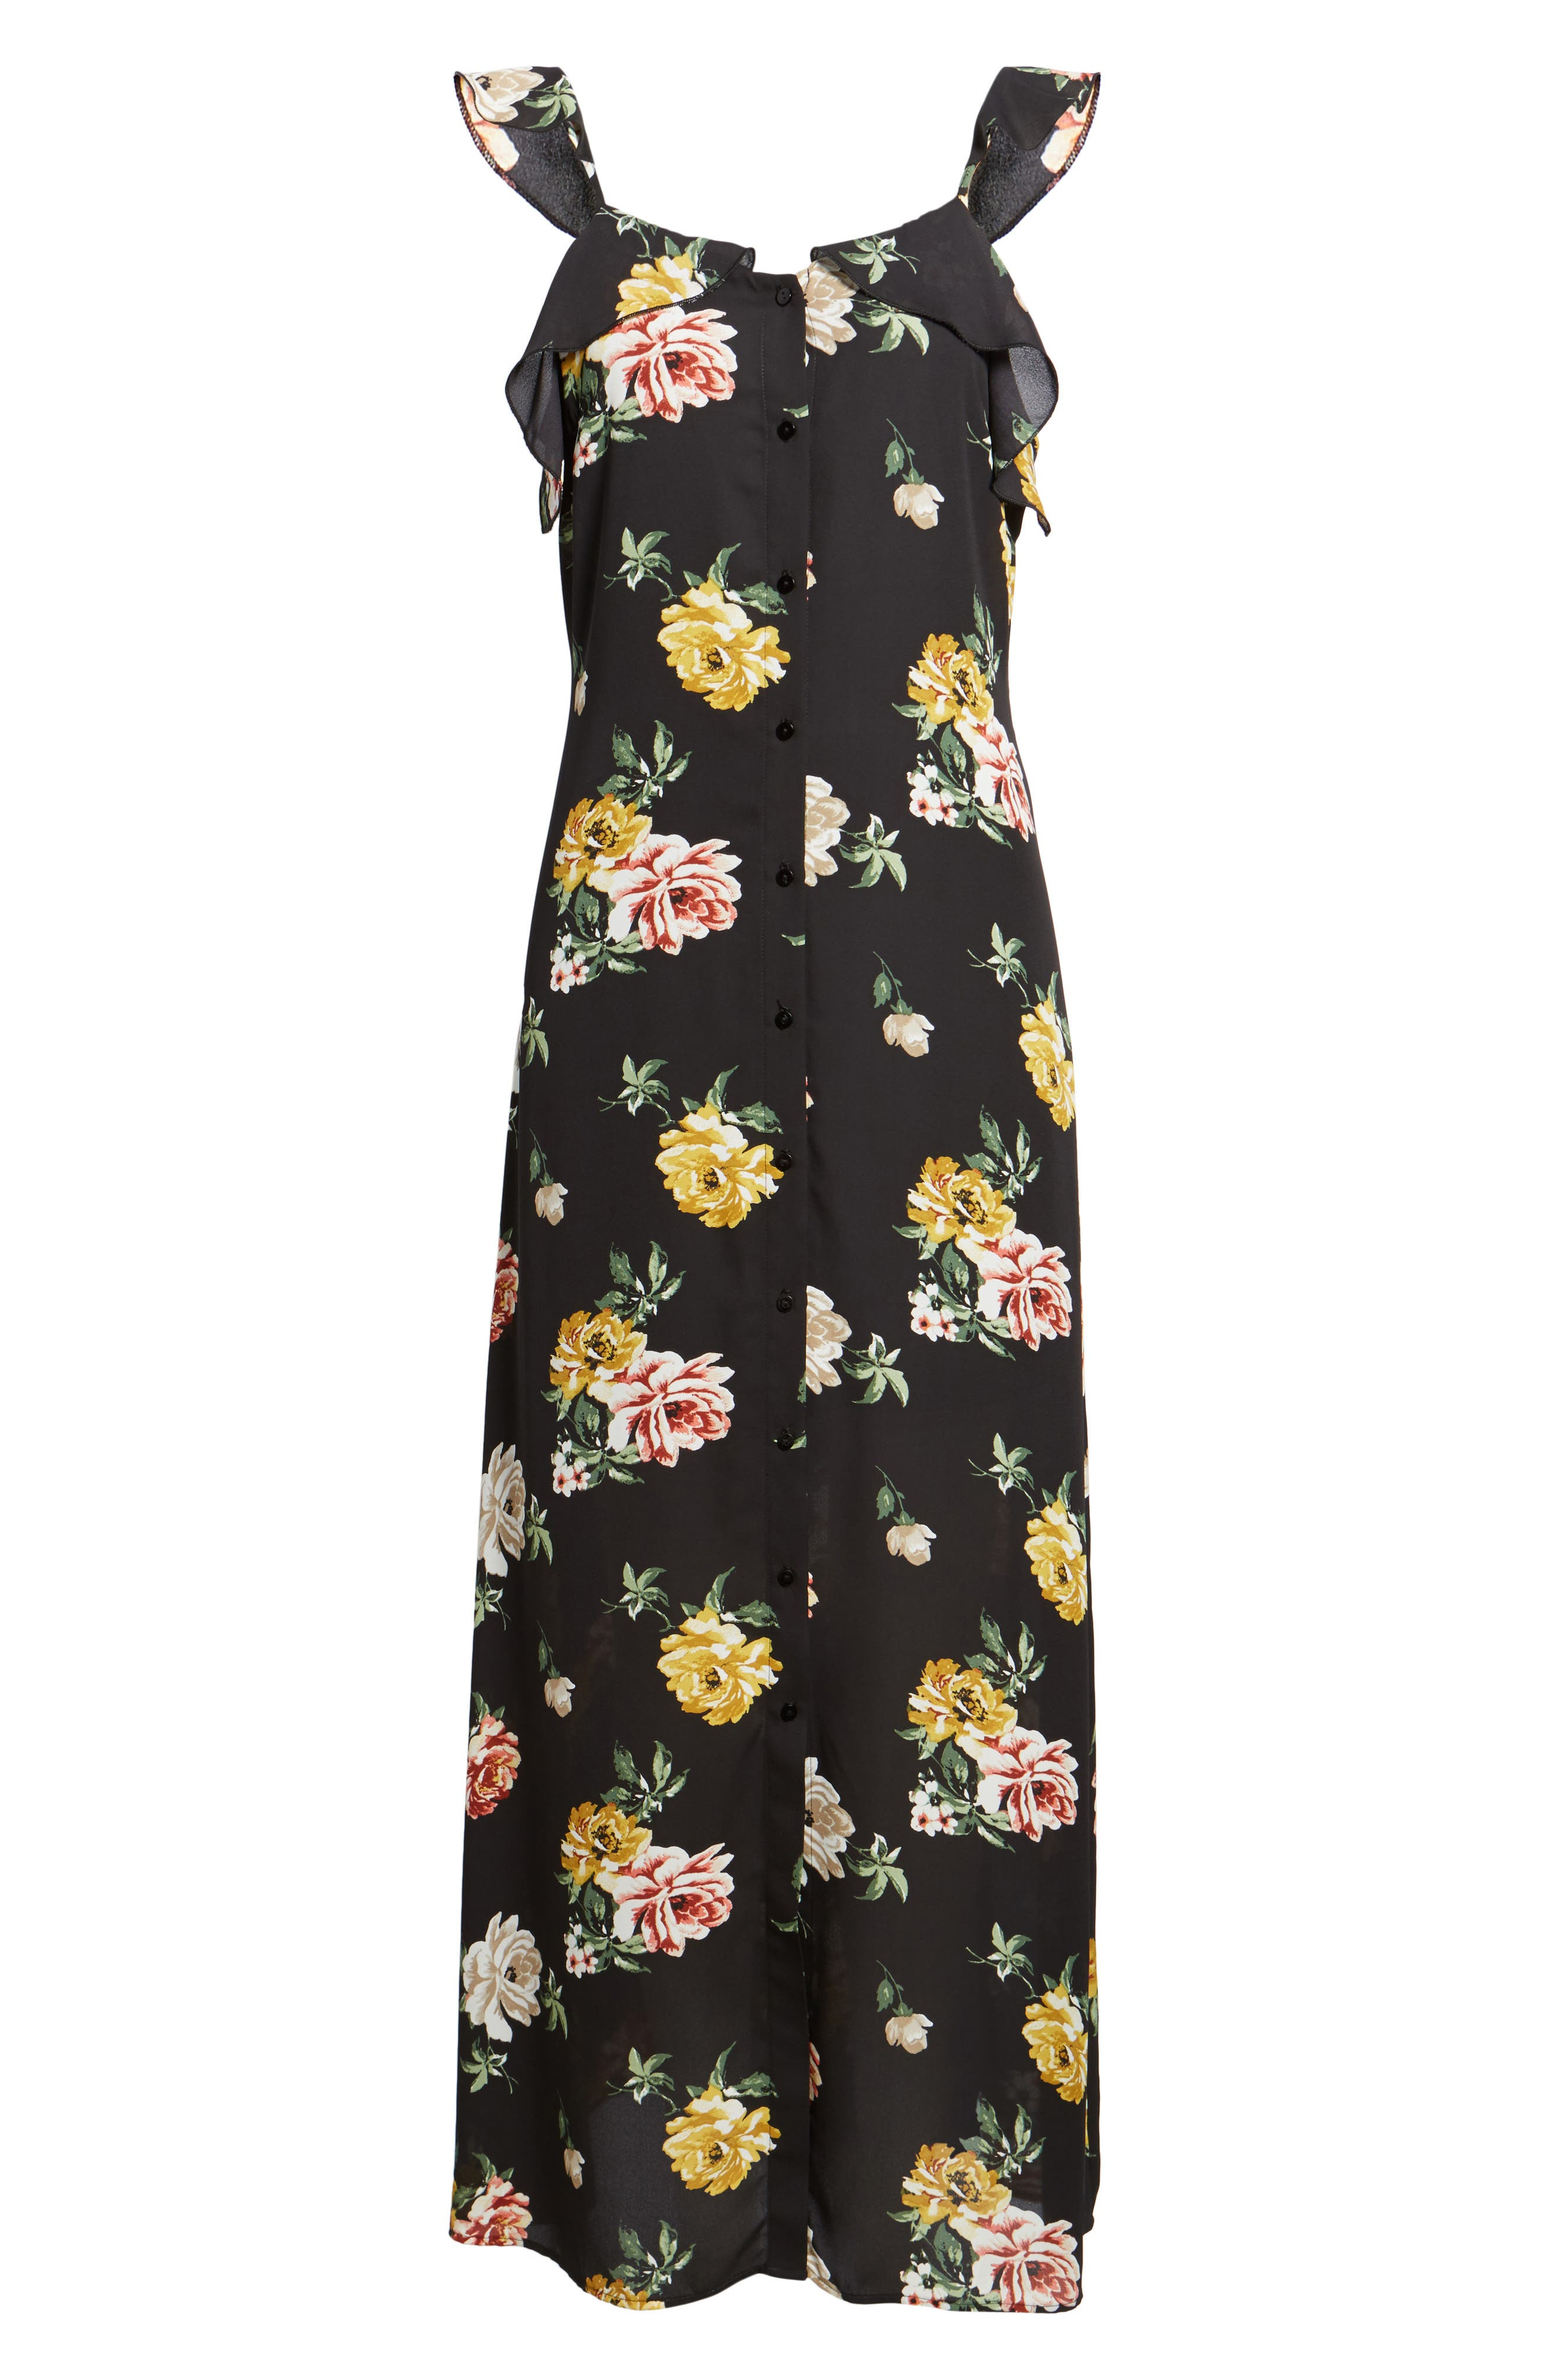 Floral Ruffle Strap Maxi Dress,                             Alternate thumbnail 6, color,                             Black Large Floral Print